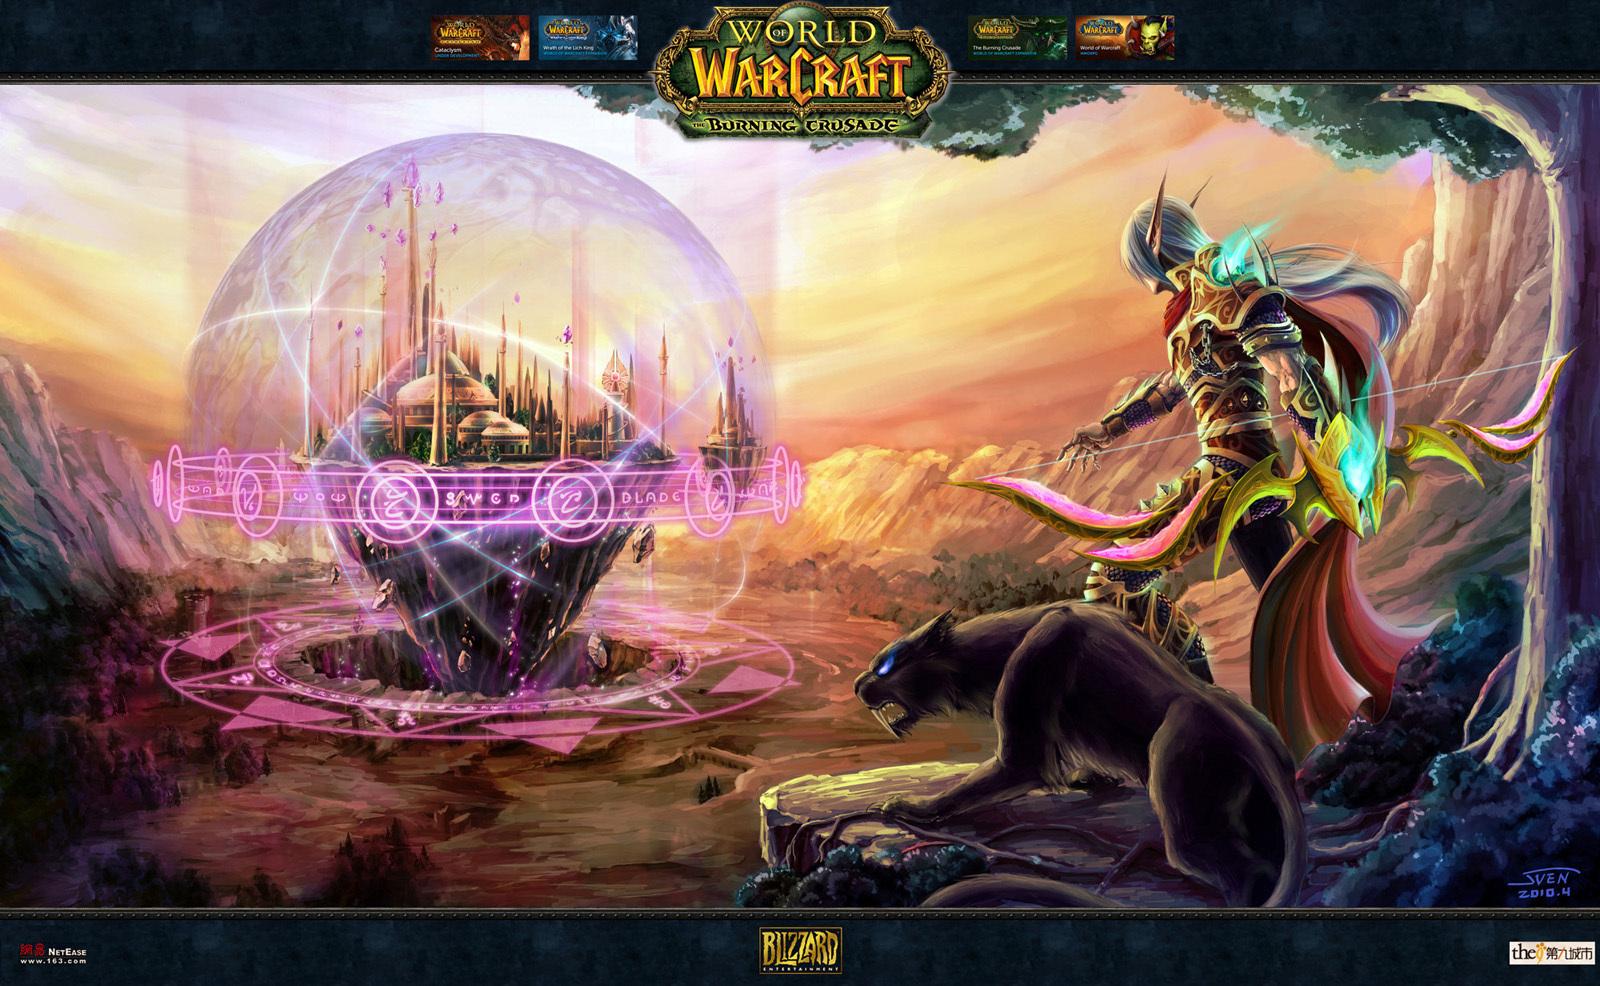 World of Warcraft wow wallpaperz 1600x986